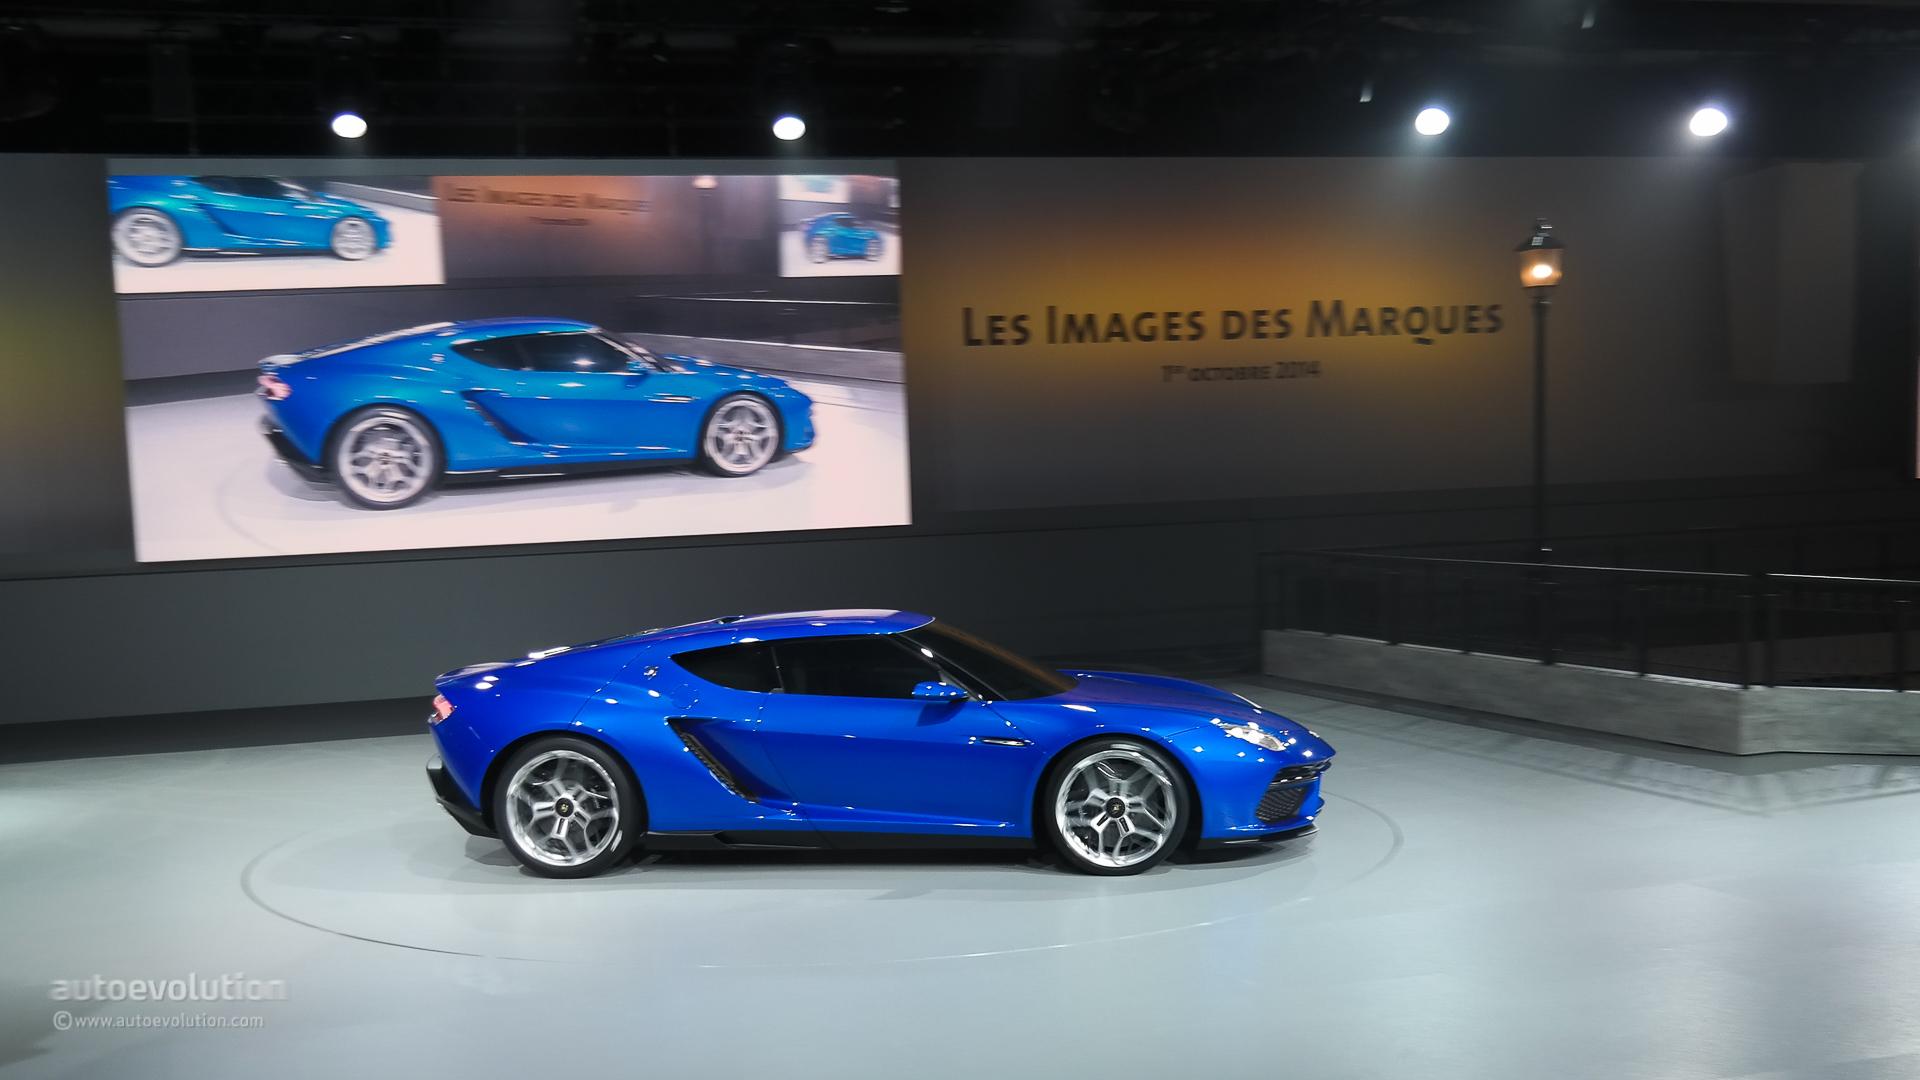 Lamborghini Asterion Lpi 910 4 Looks Like An Estoque Evora Mashup